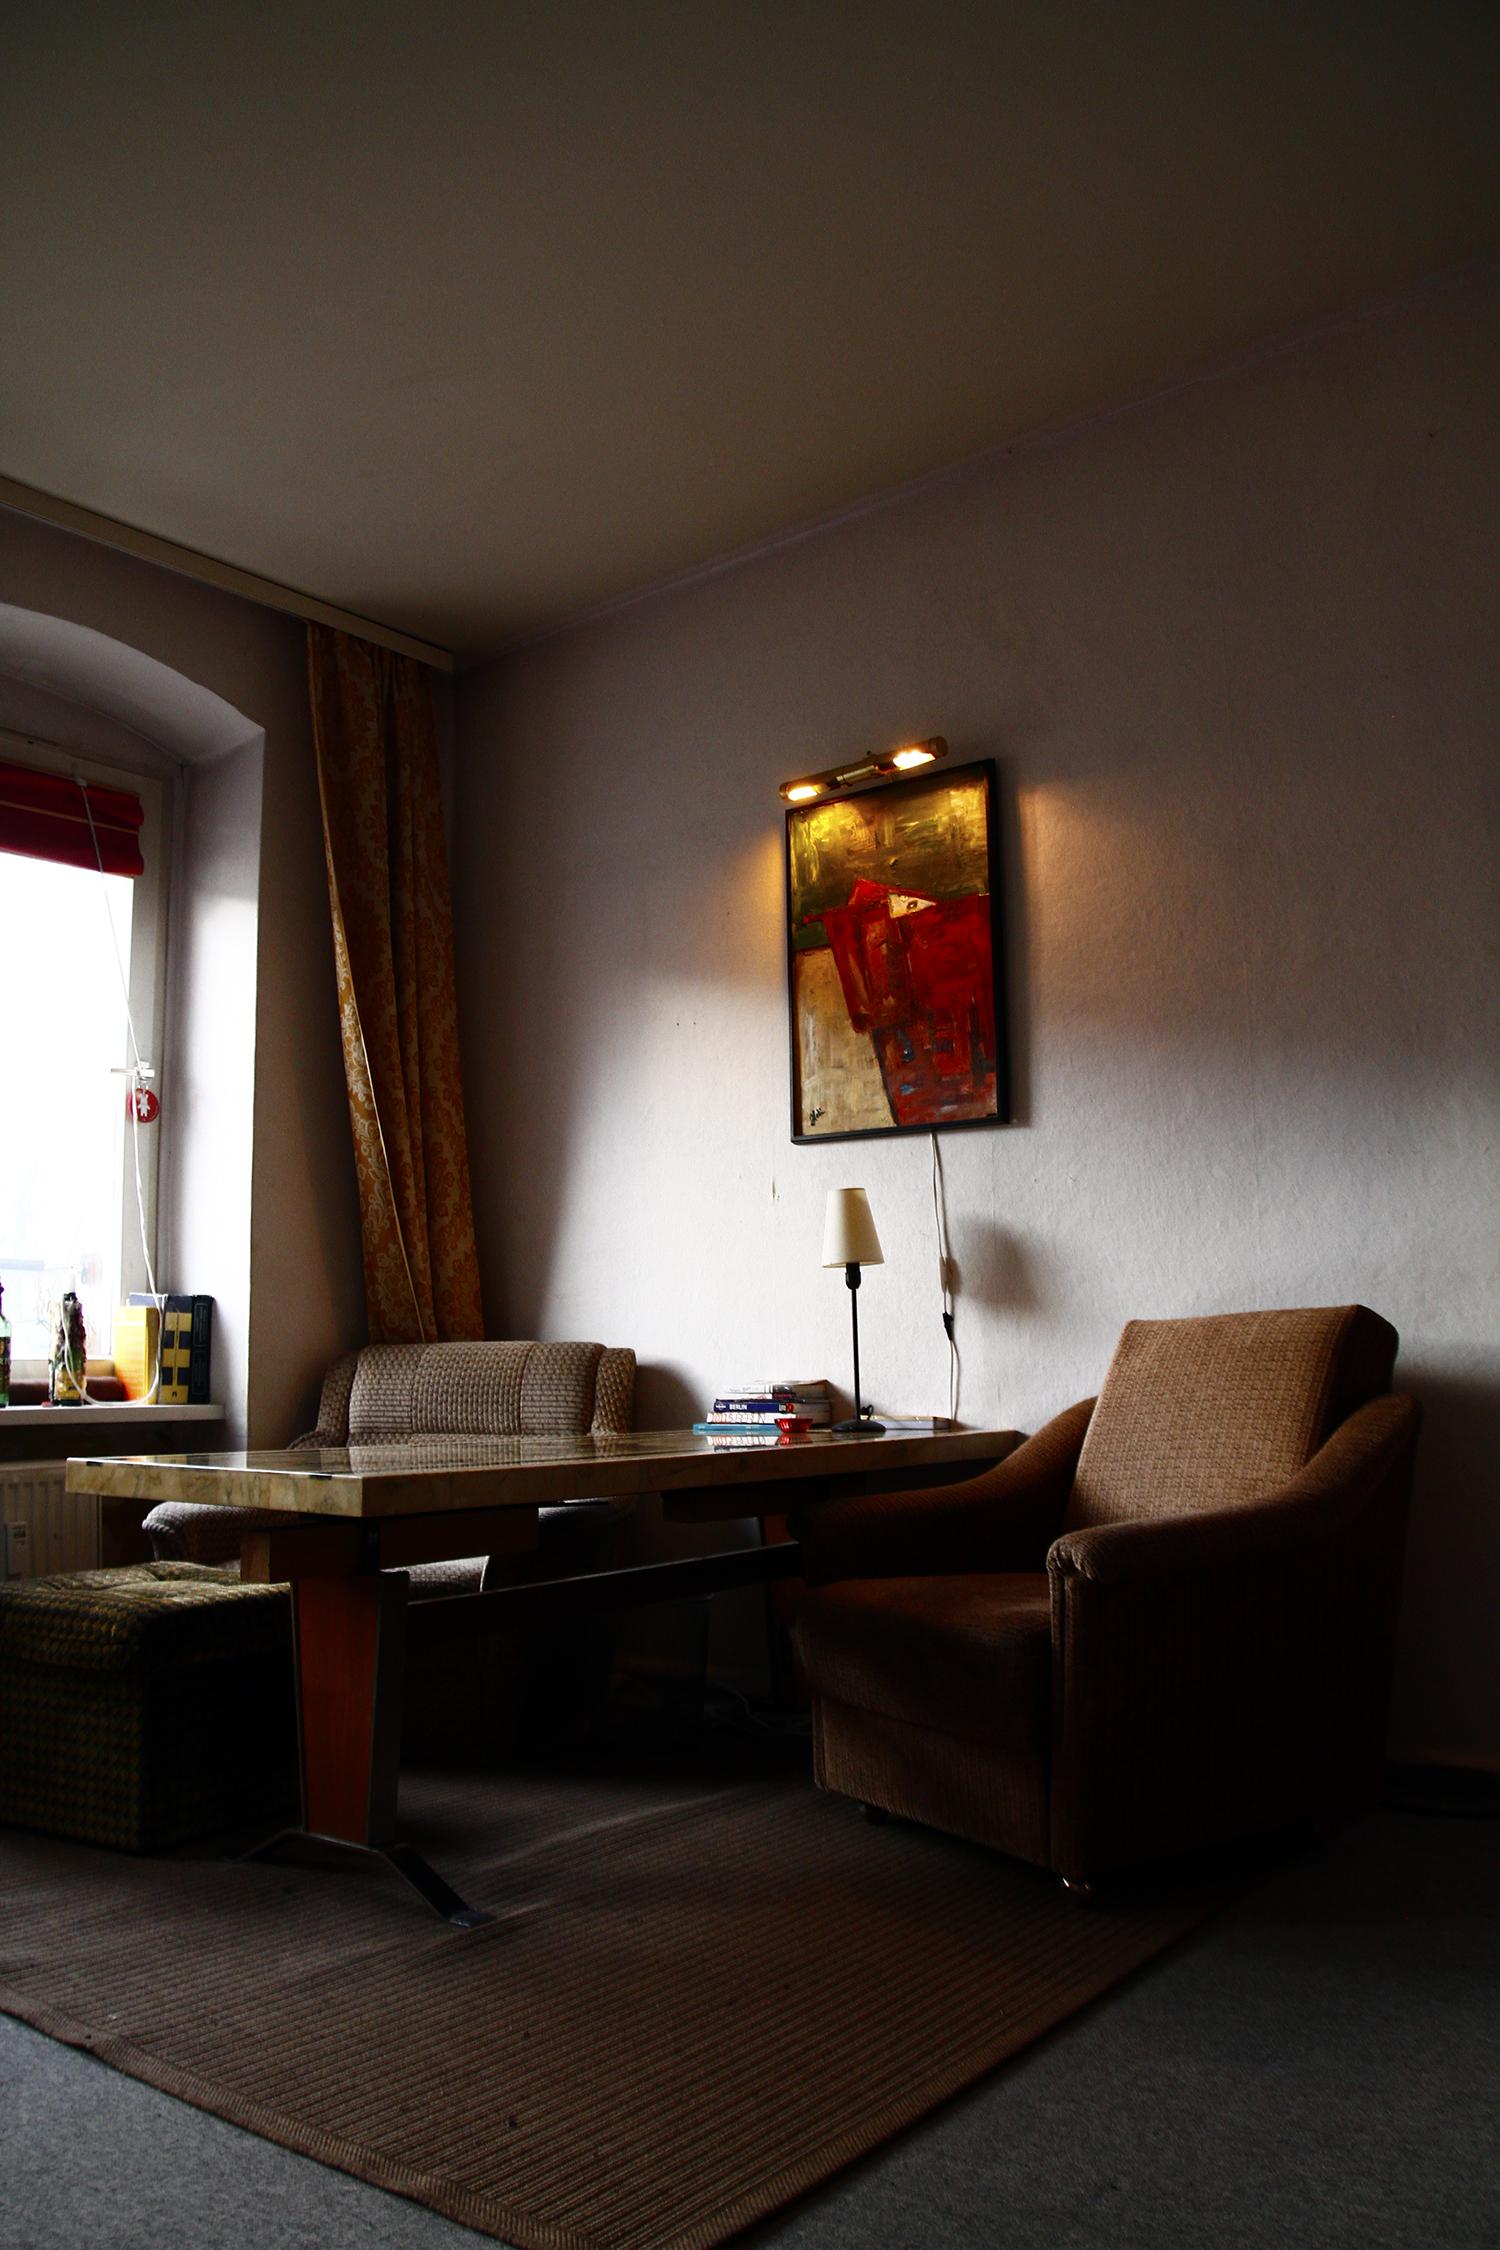 Tuukka13 - The Russian Style Apartment in Kreuzberg, Berlin - 02/2012